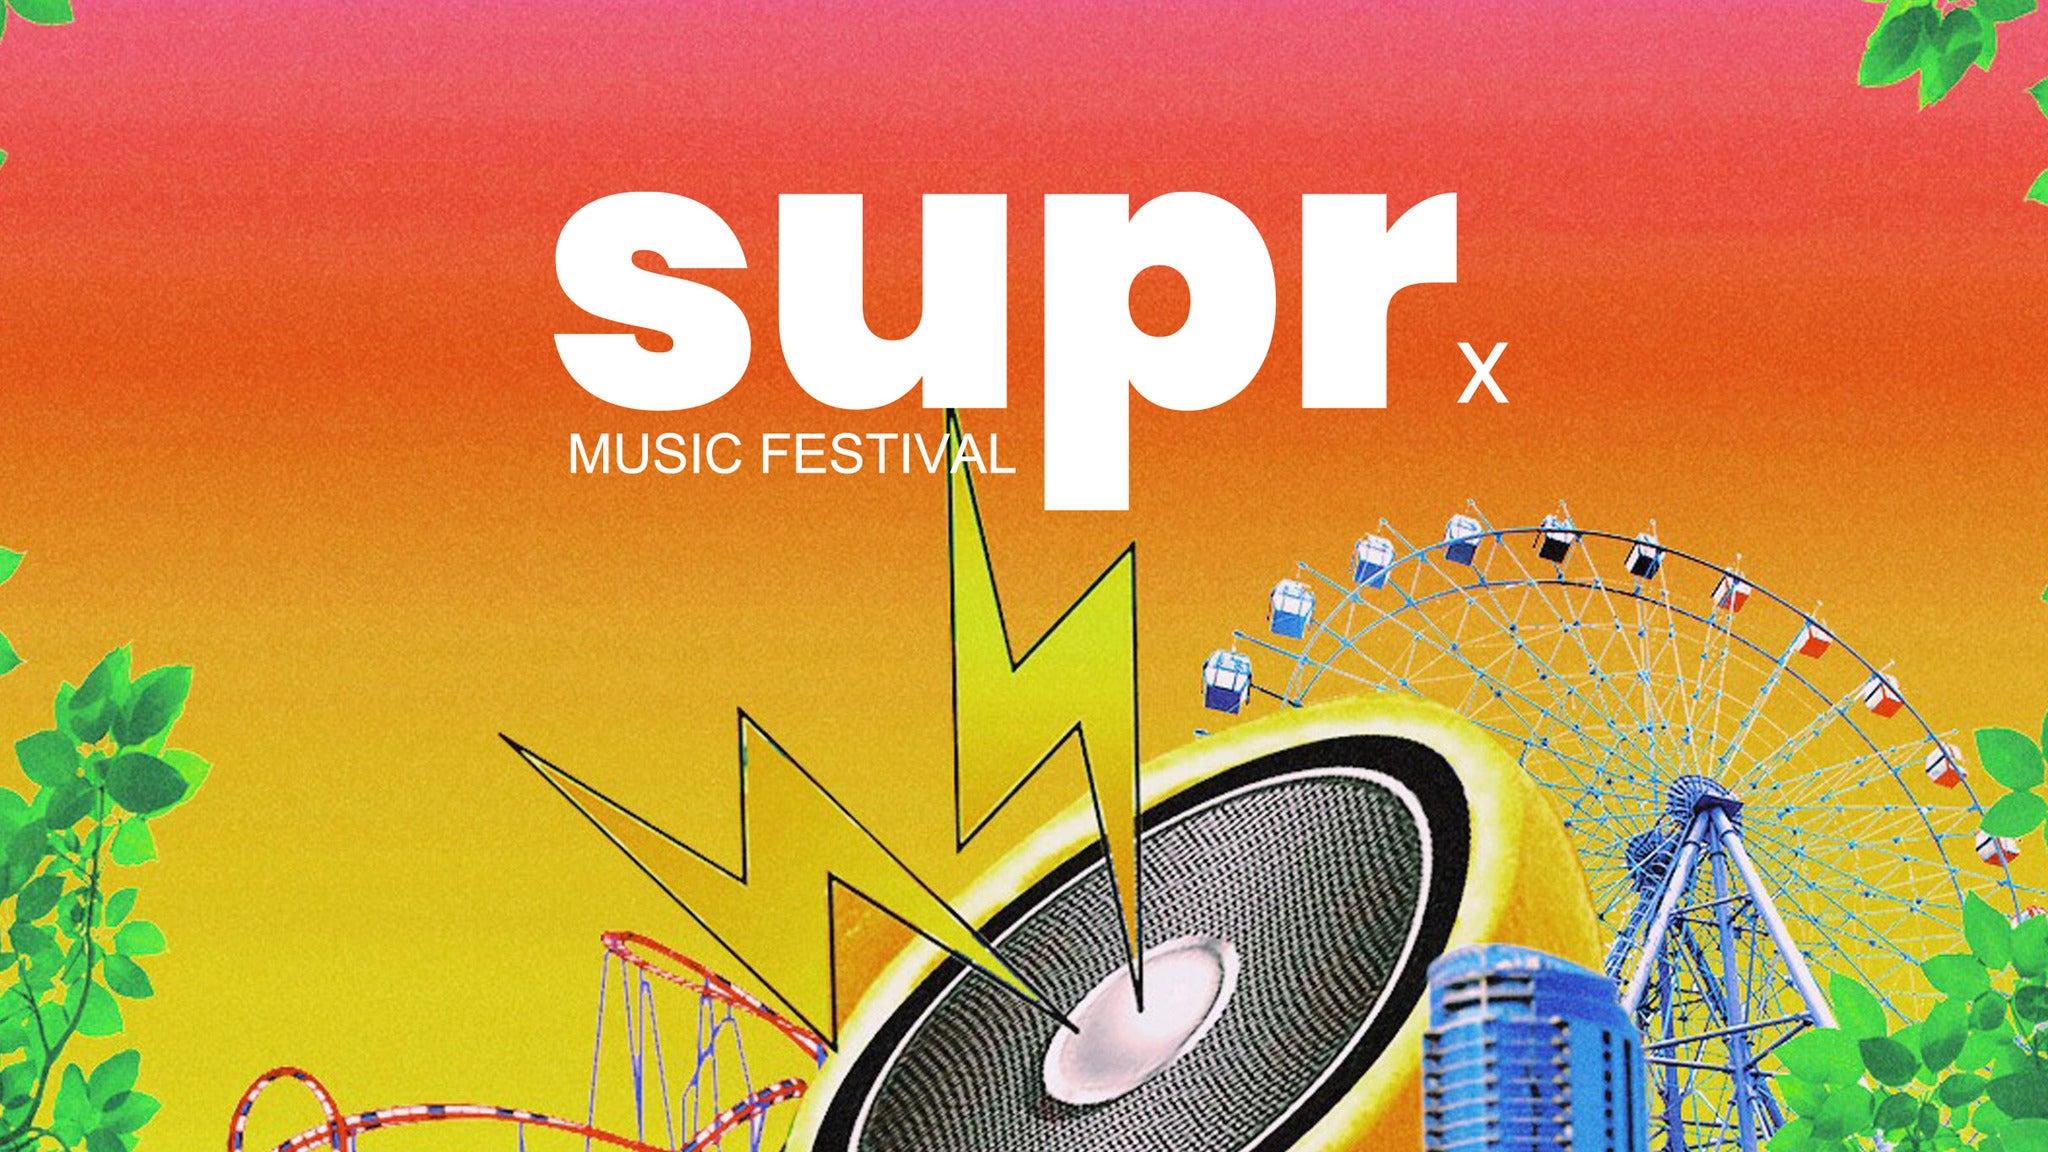 Supr Music Festival